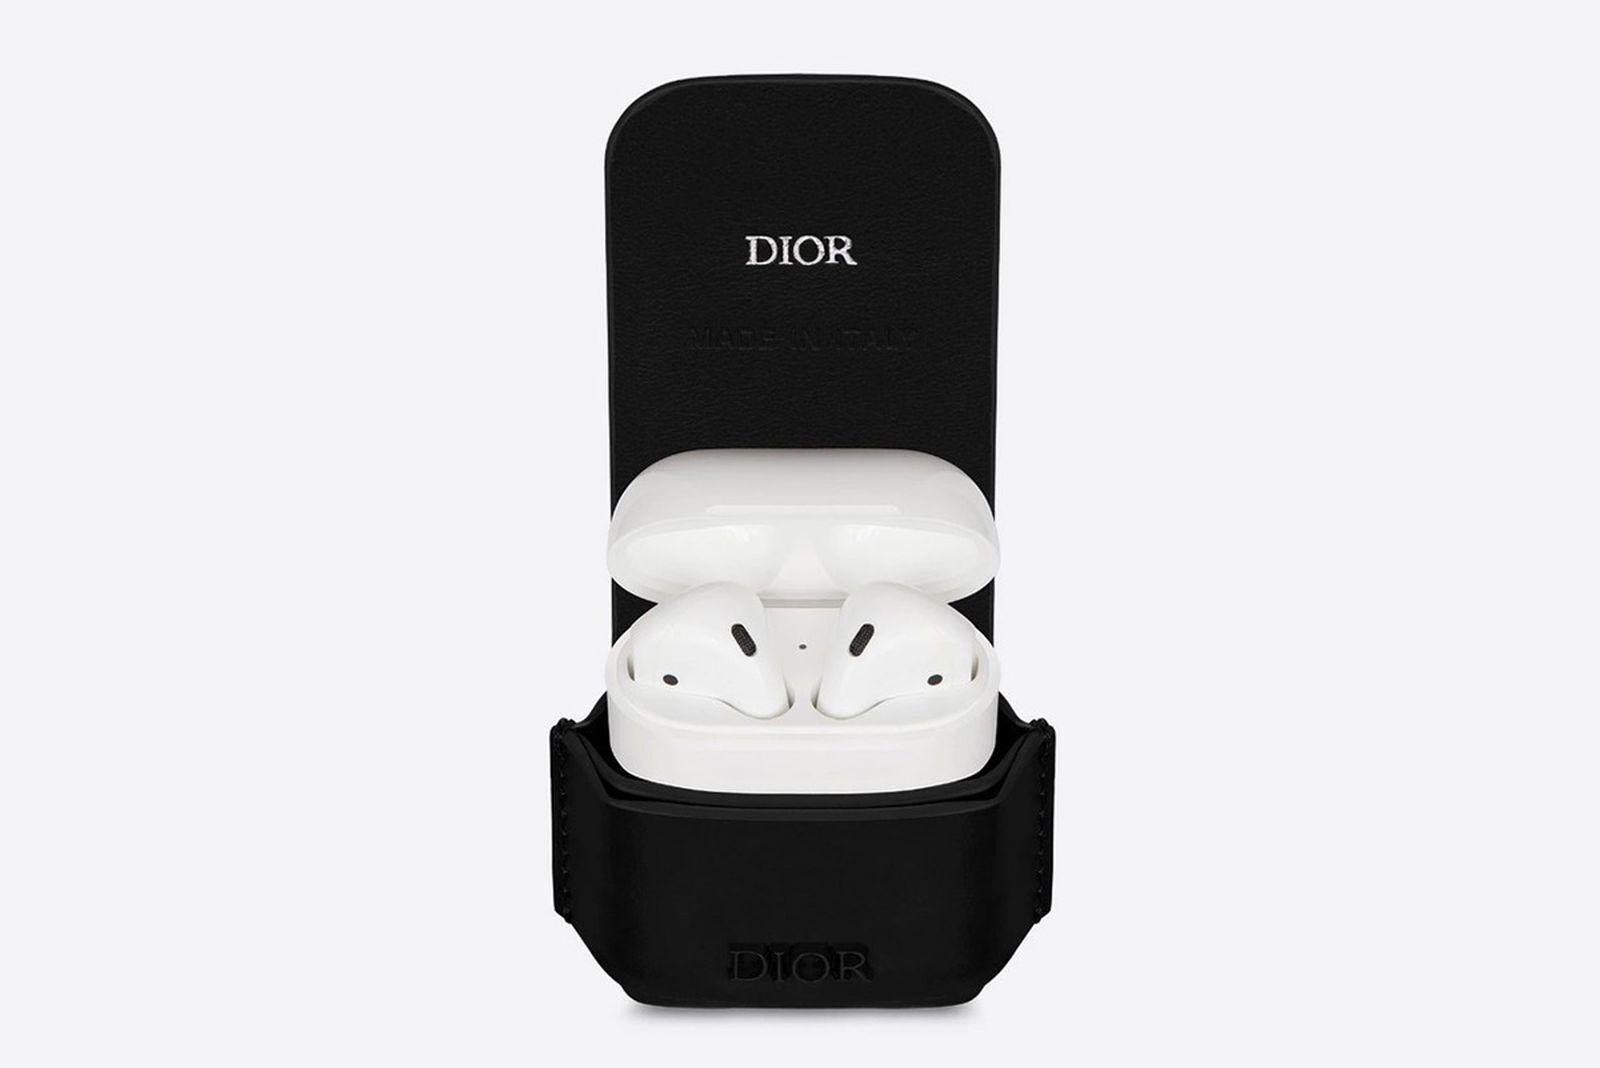 dior airpods case